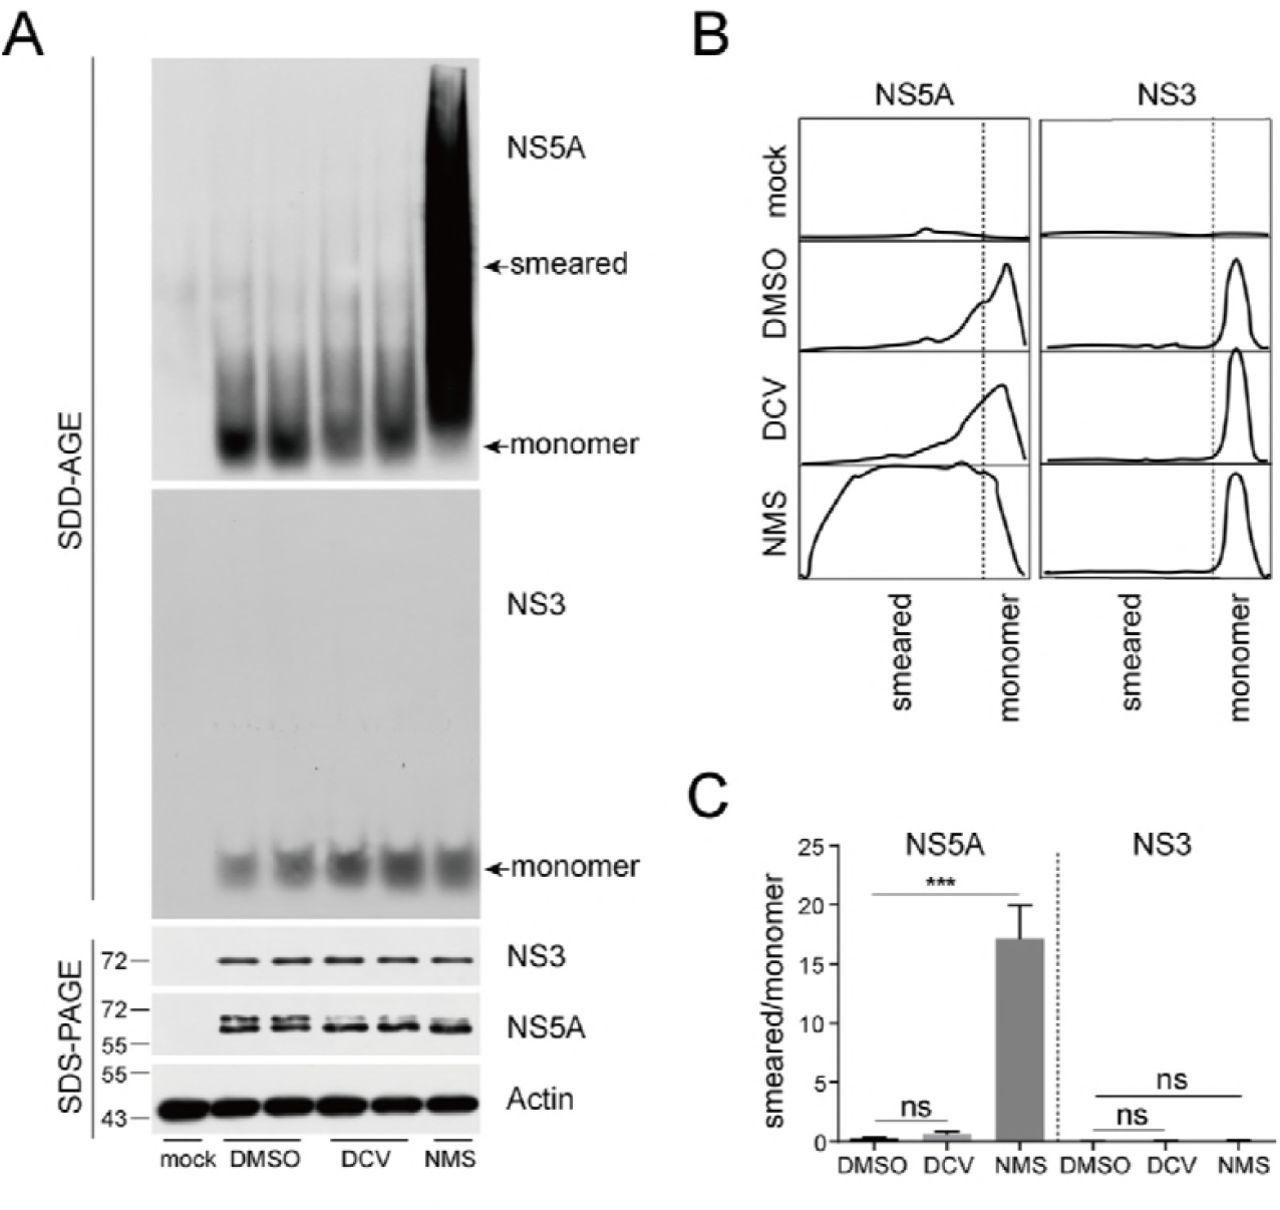 Hepatitis C virus NS5A inhibitor daclatasvir allosterically